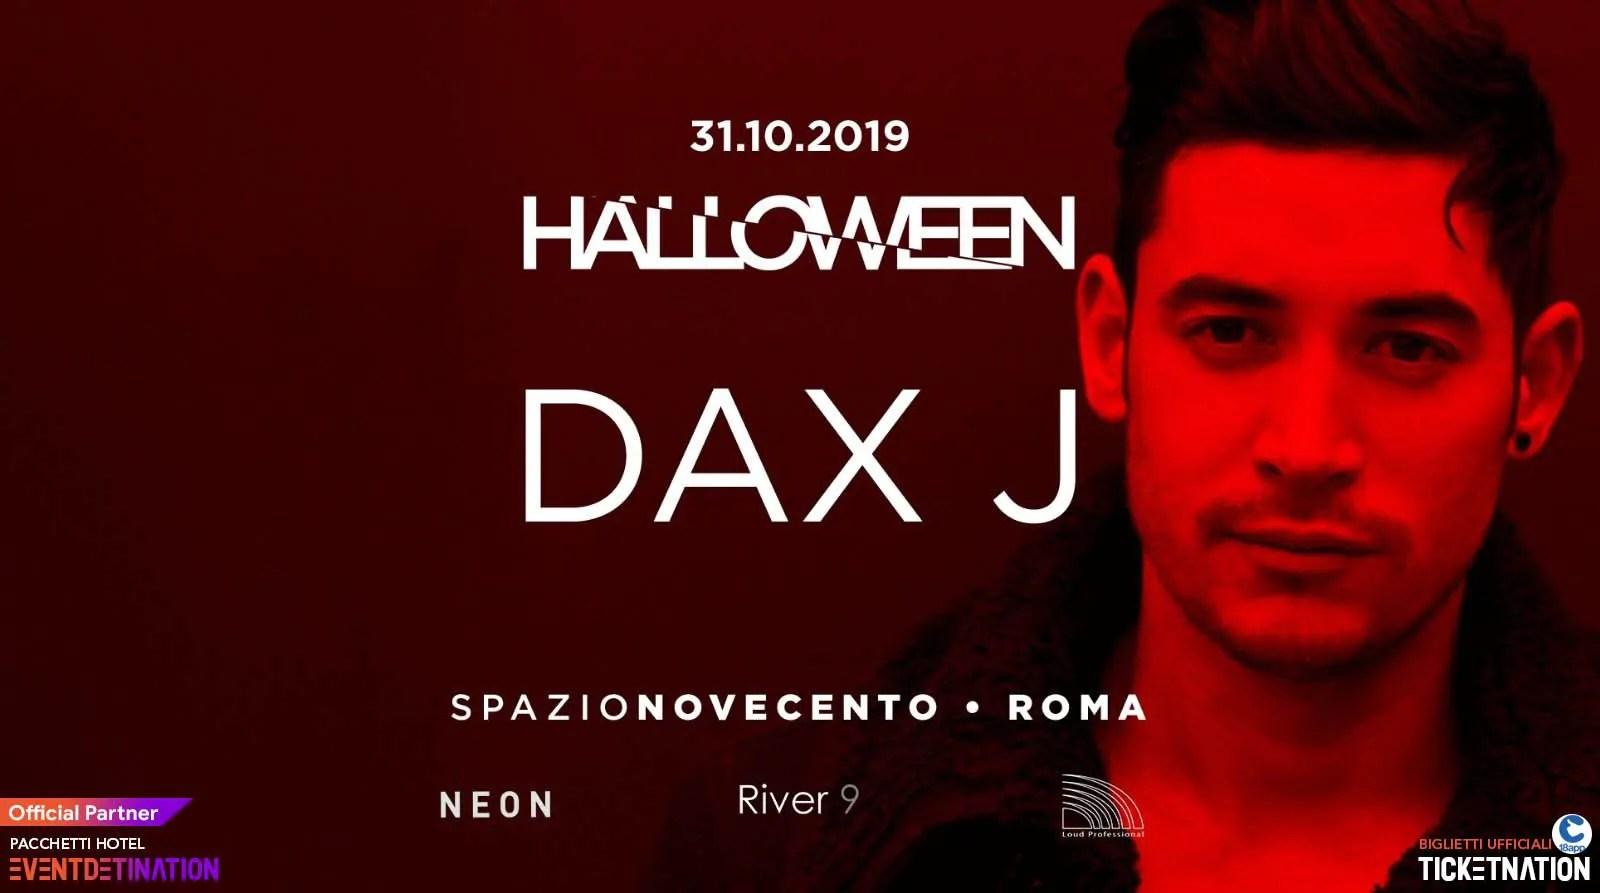 Halloween 2019 Dax J Spazio Novecento Roma – 31 Ottobre 2019